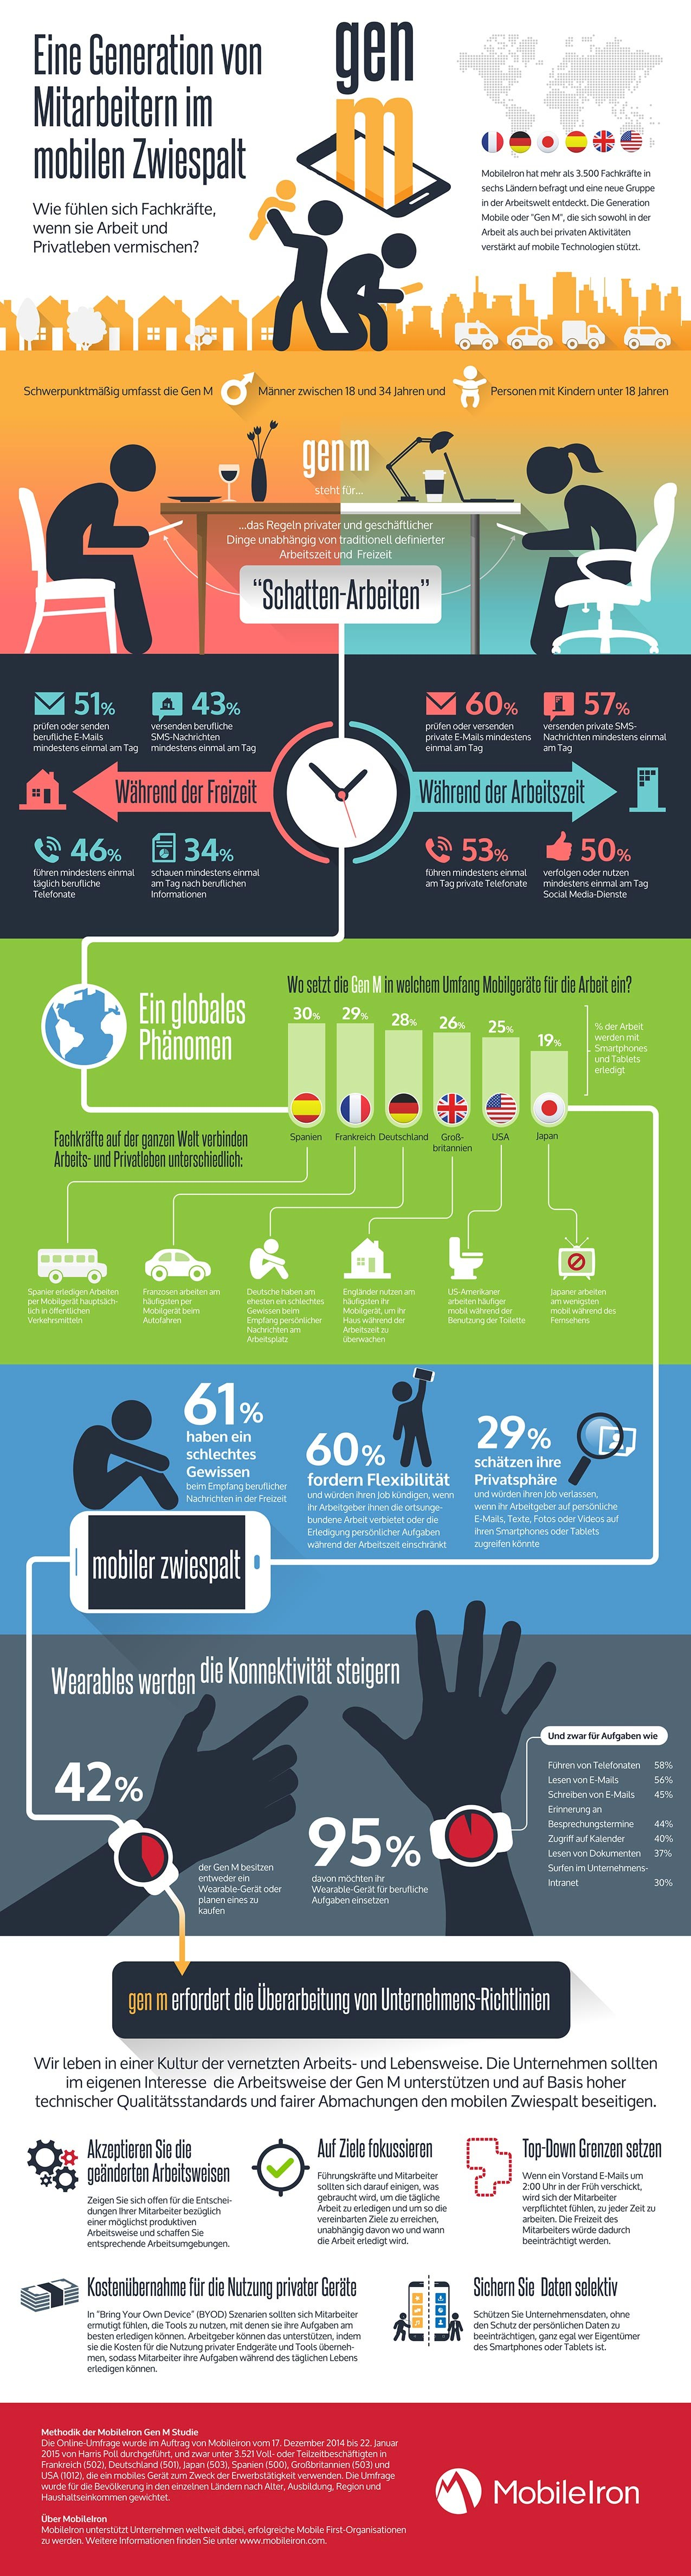 infografik mobileiron generation mobile gen m